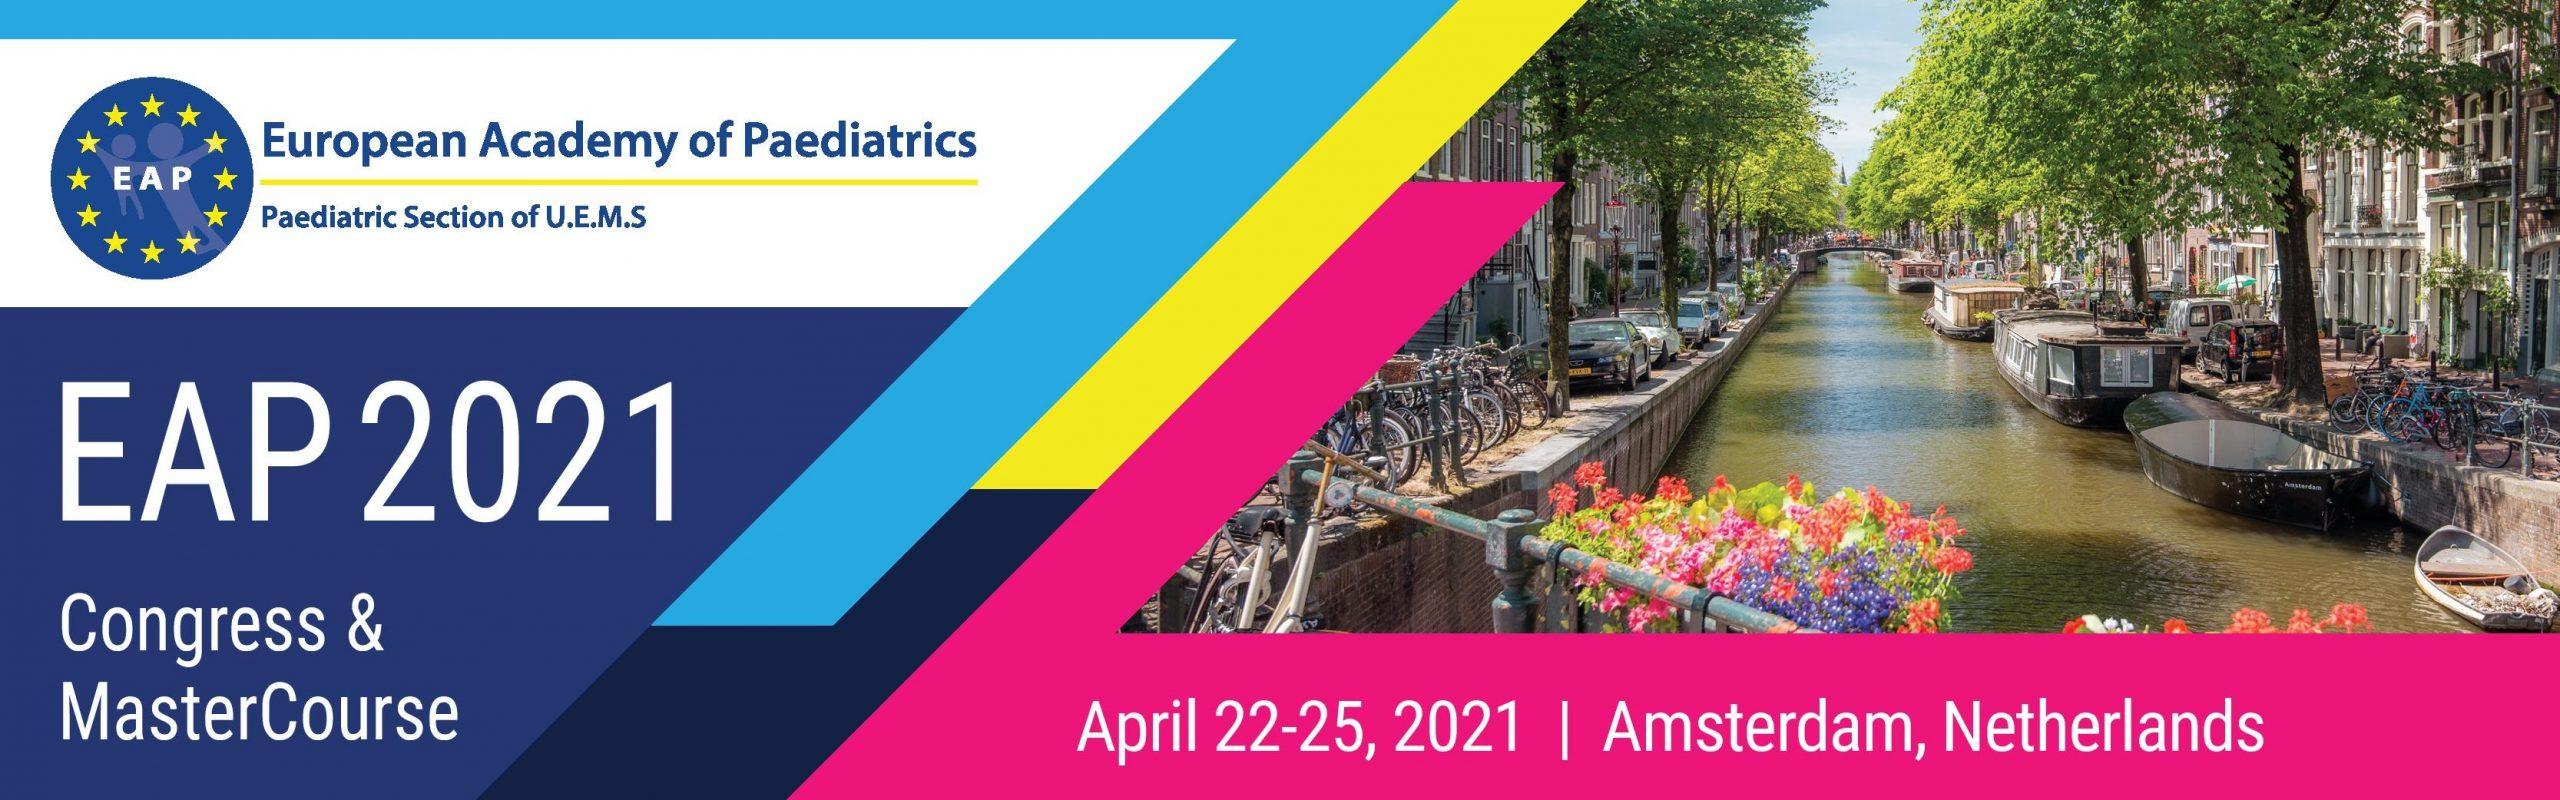 EAP 2021 European Academy of Paediatrics Congress and MasterCourse